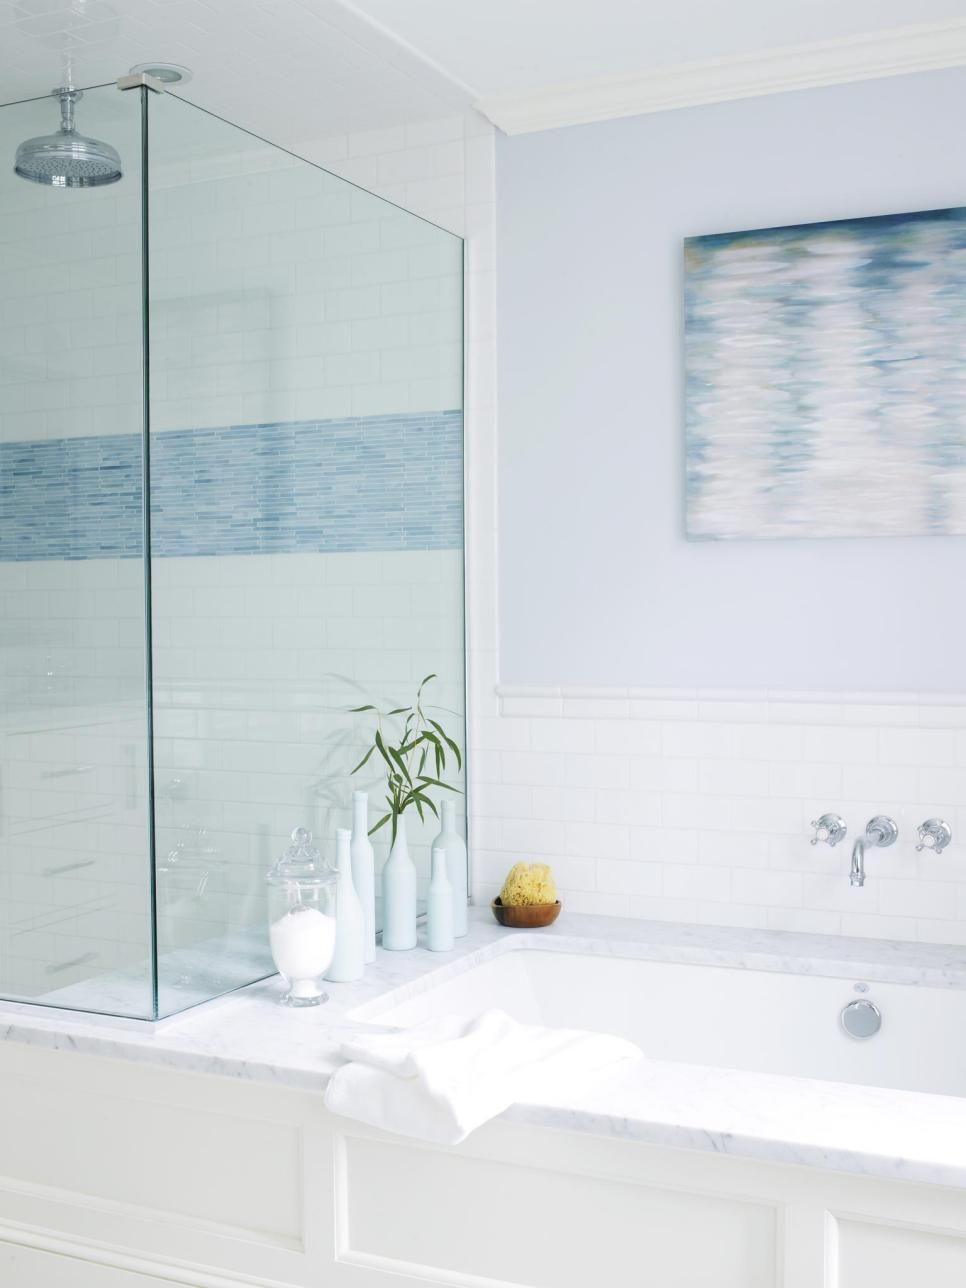 Cool Ways to Beach Up Your House   Hgtv magazine, Hgtv and White shower